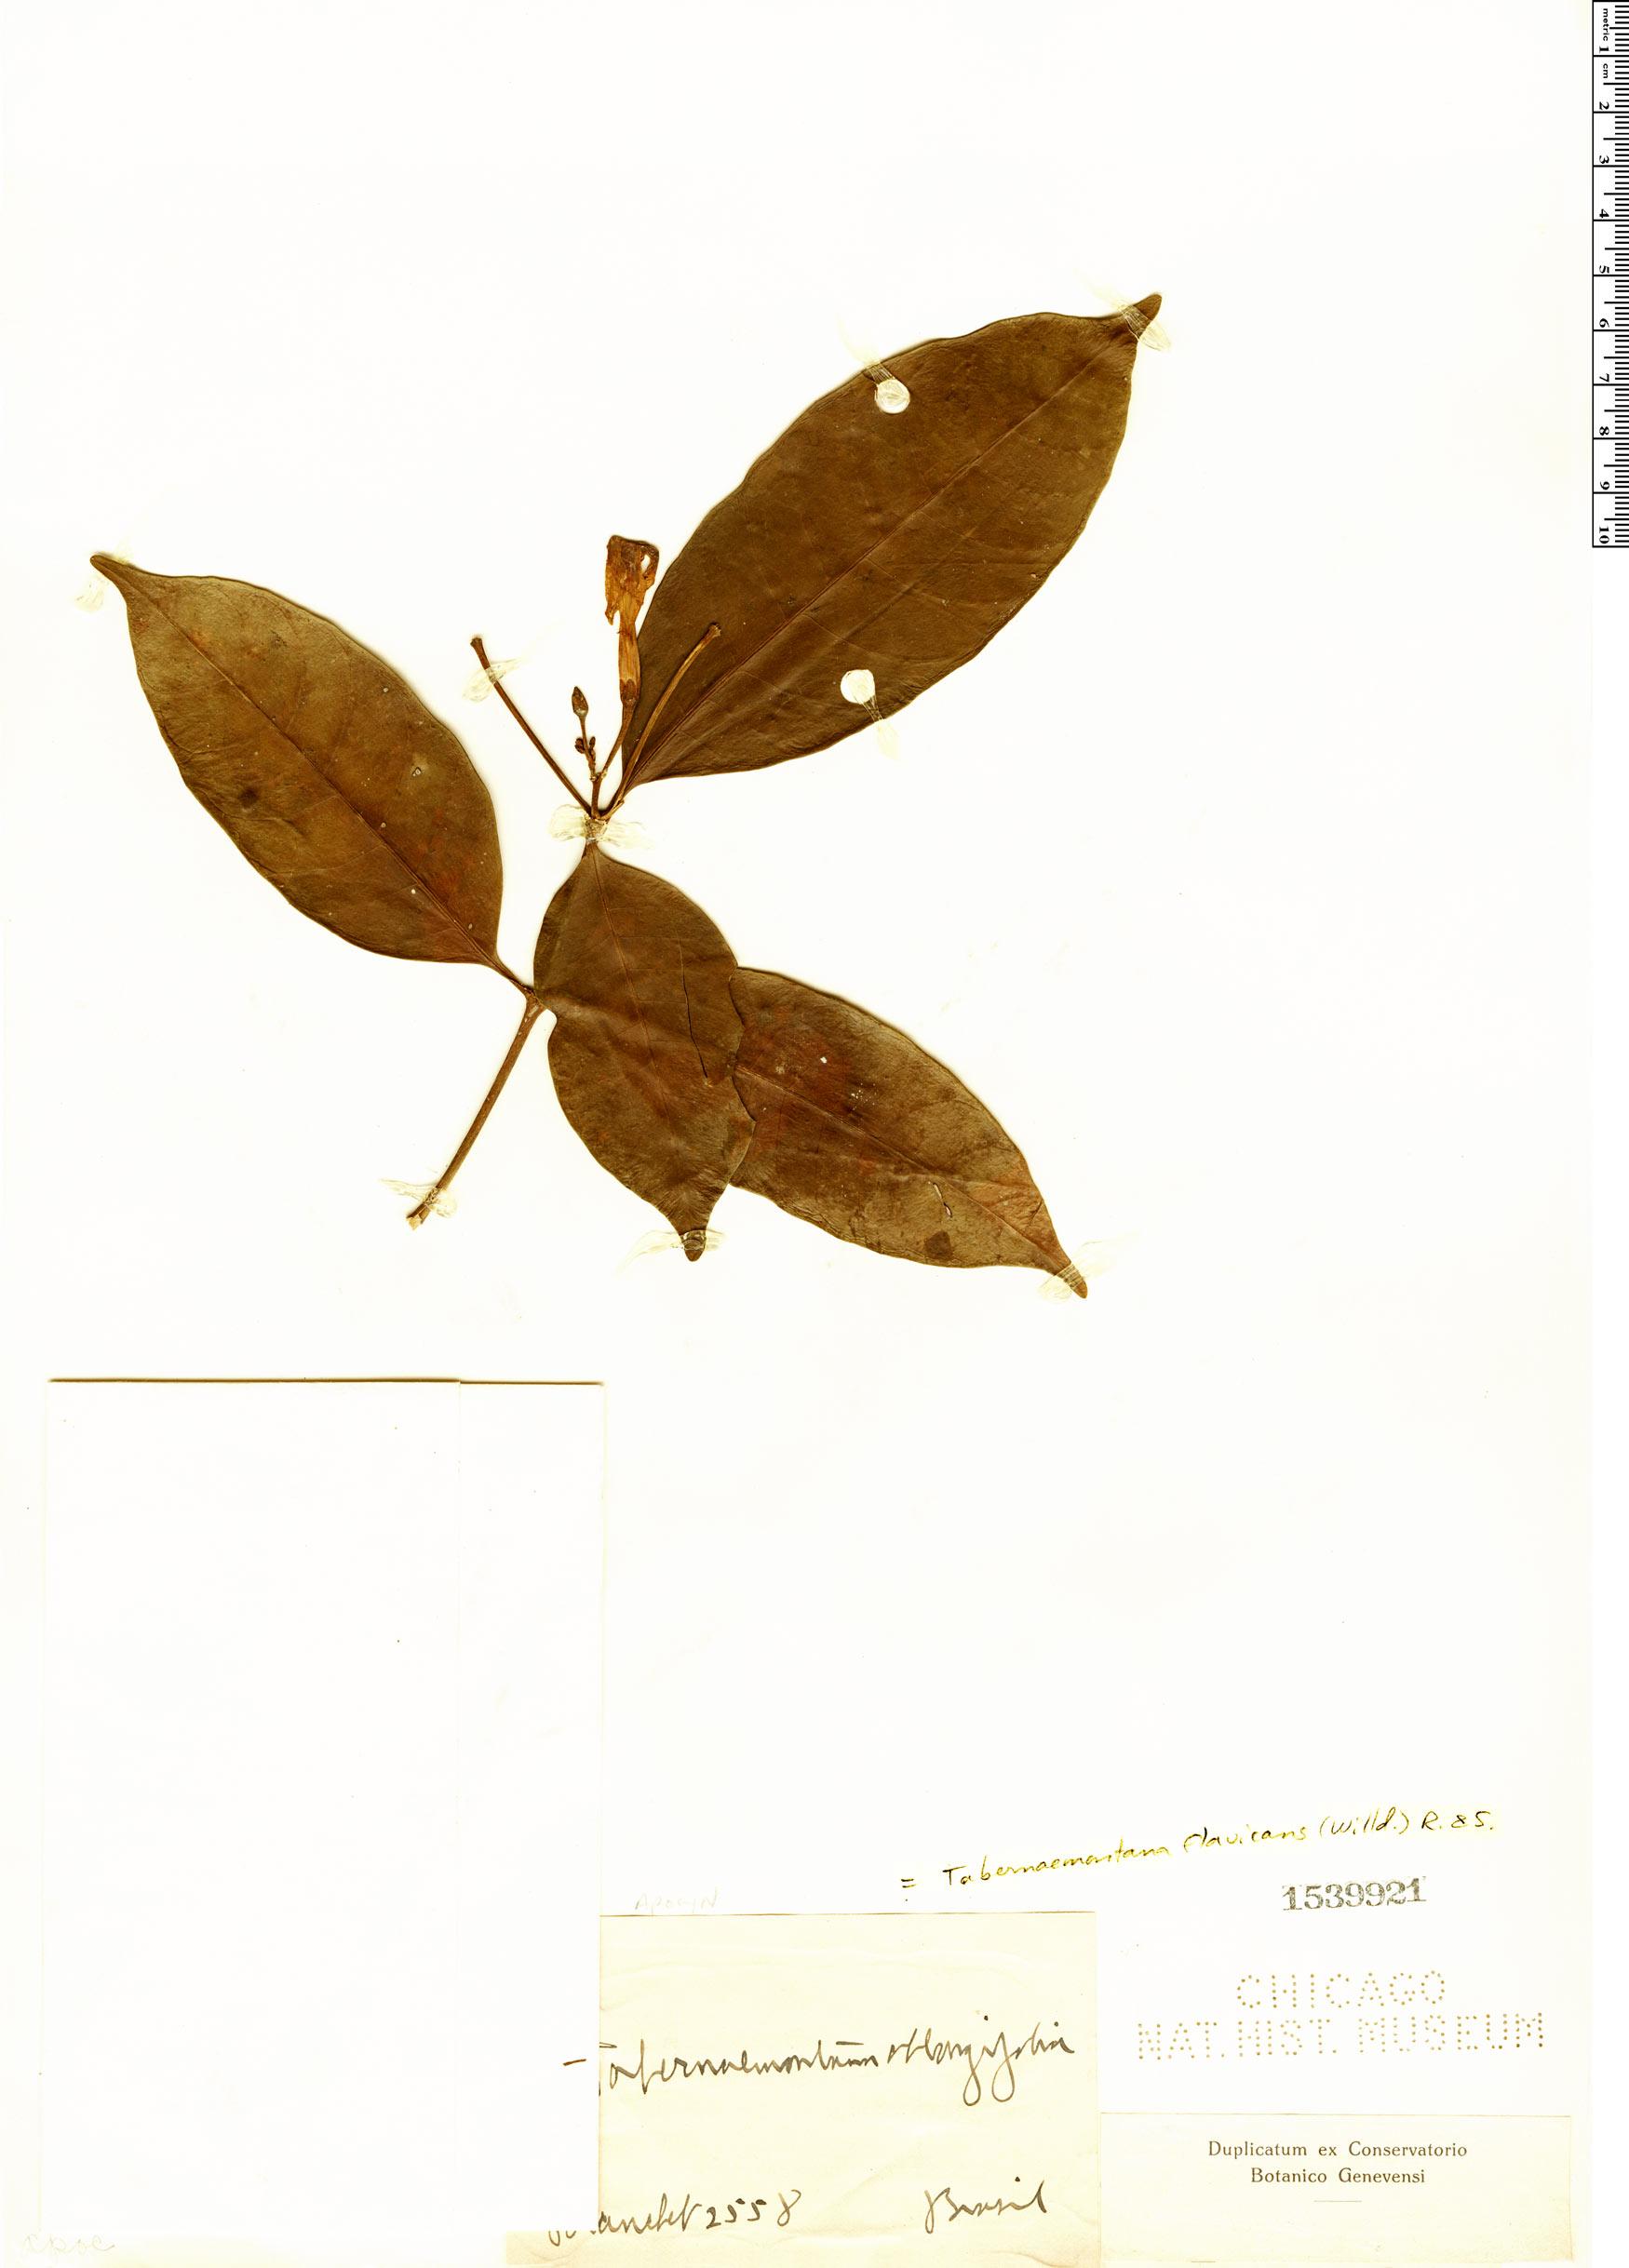 Specimen: Tabernaemontana flavicans